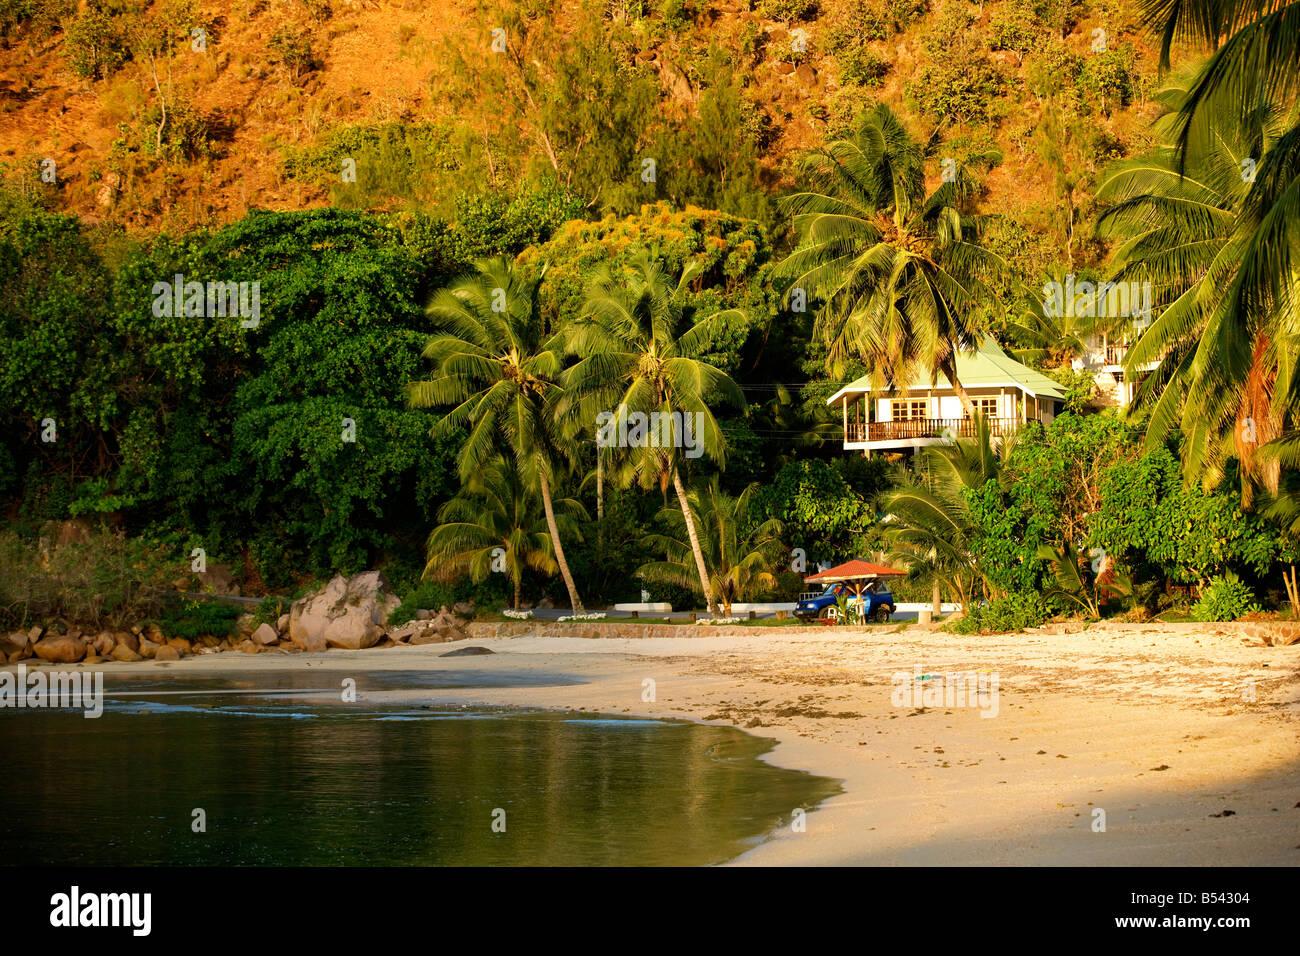 Anse Possession in Praslin island Seychelles - Stock Image